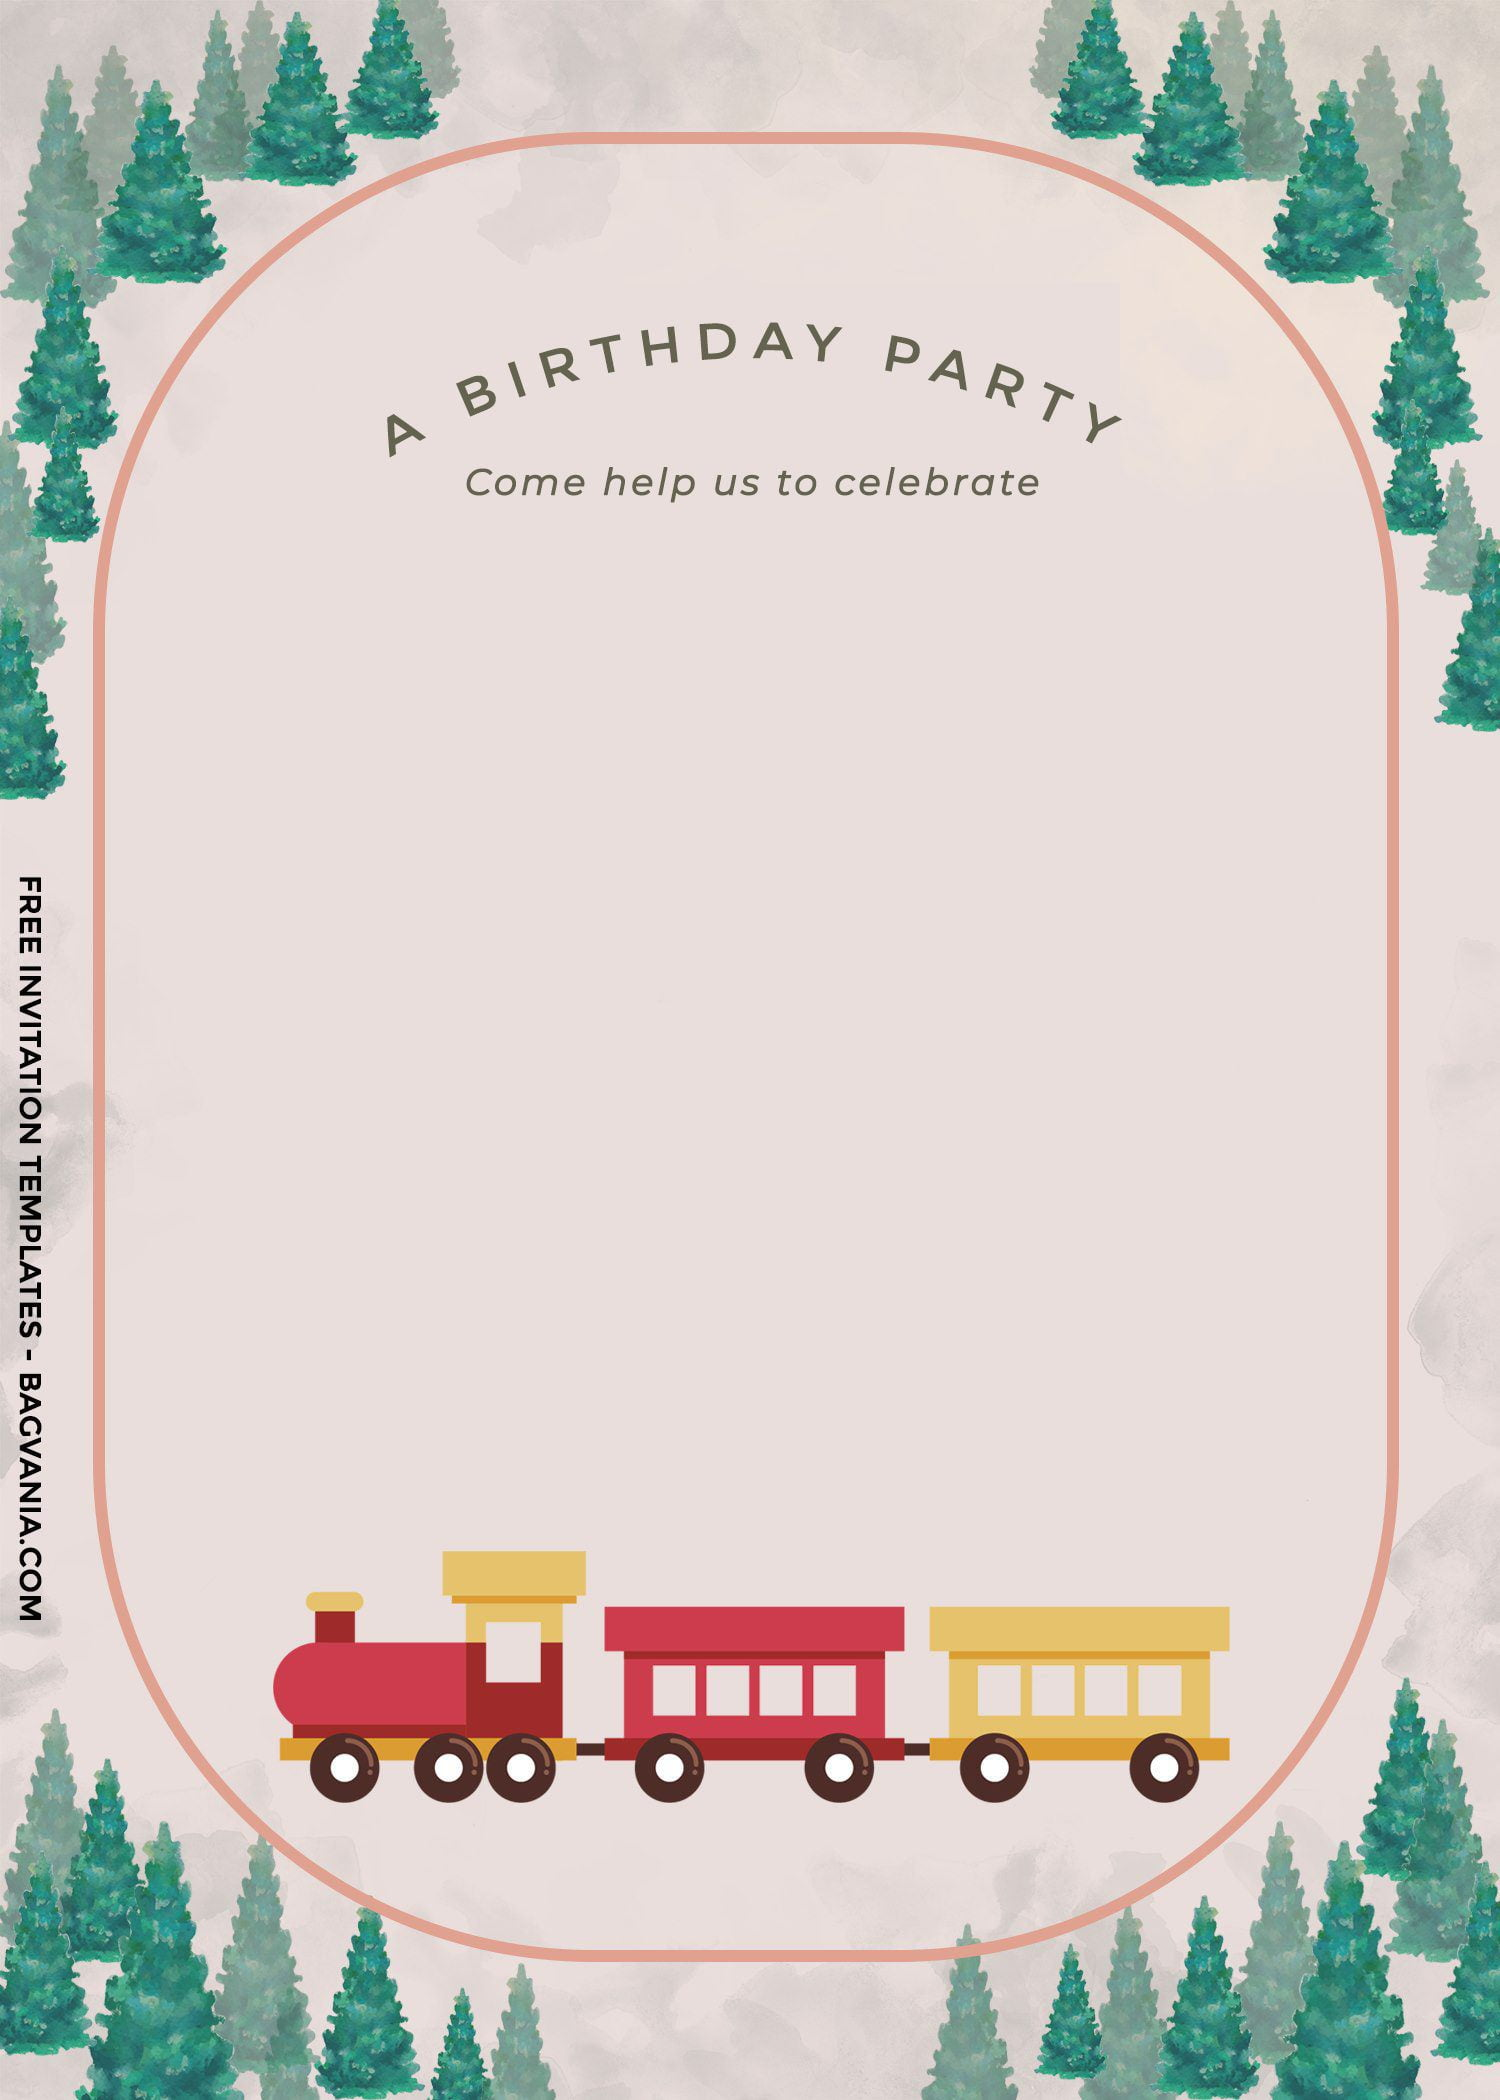 8 cute vintage train themed birthday